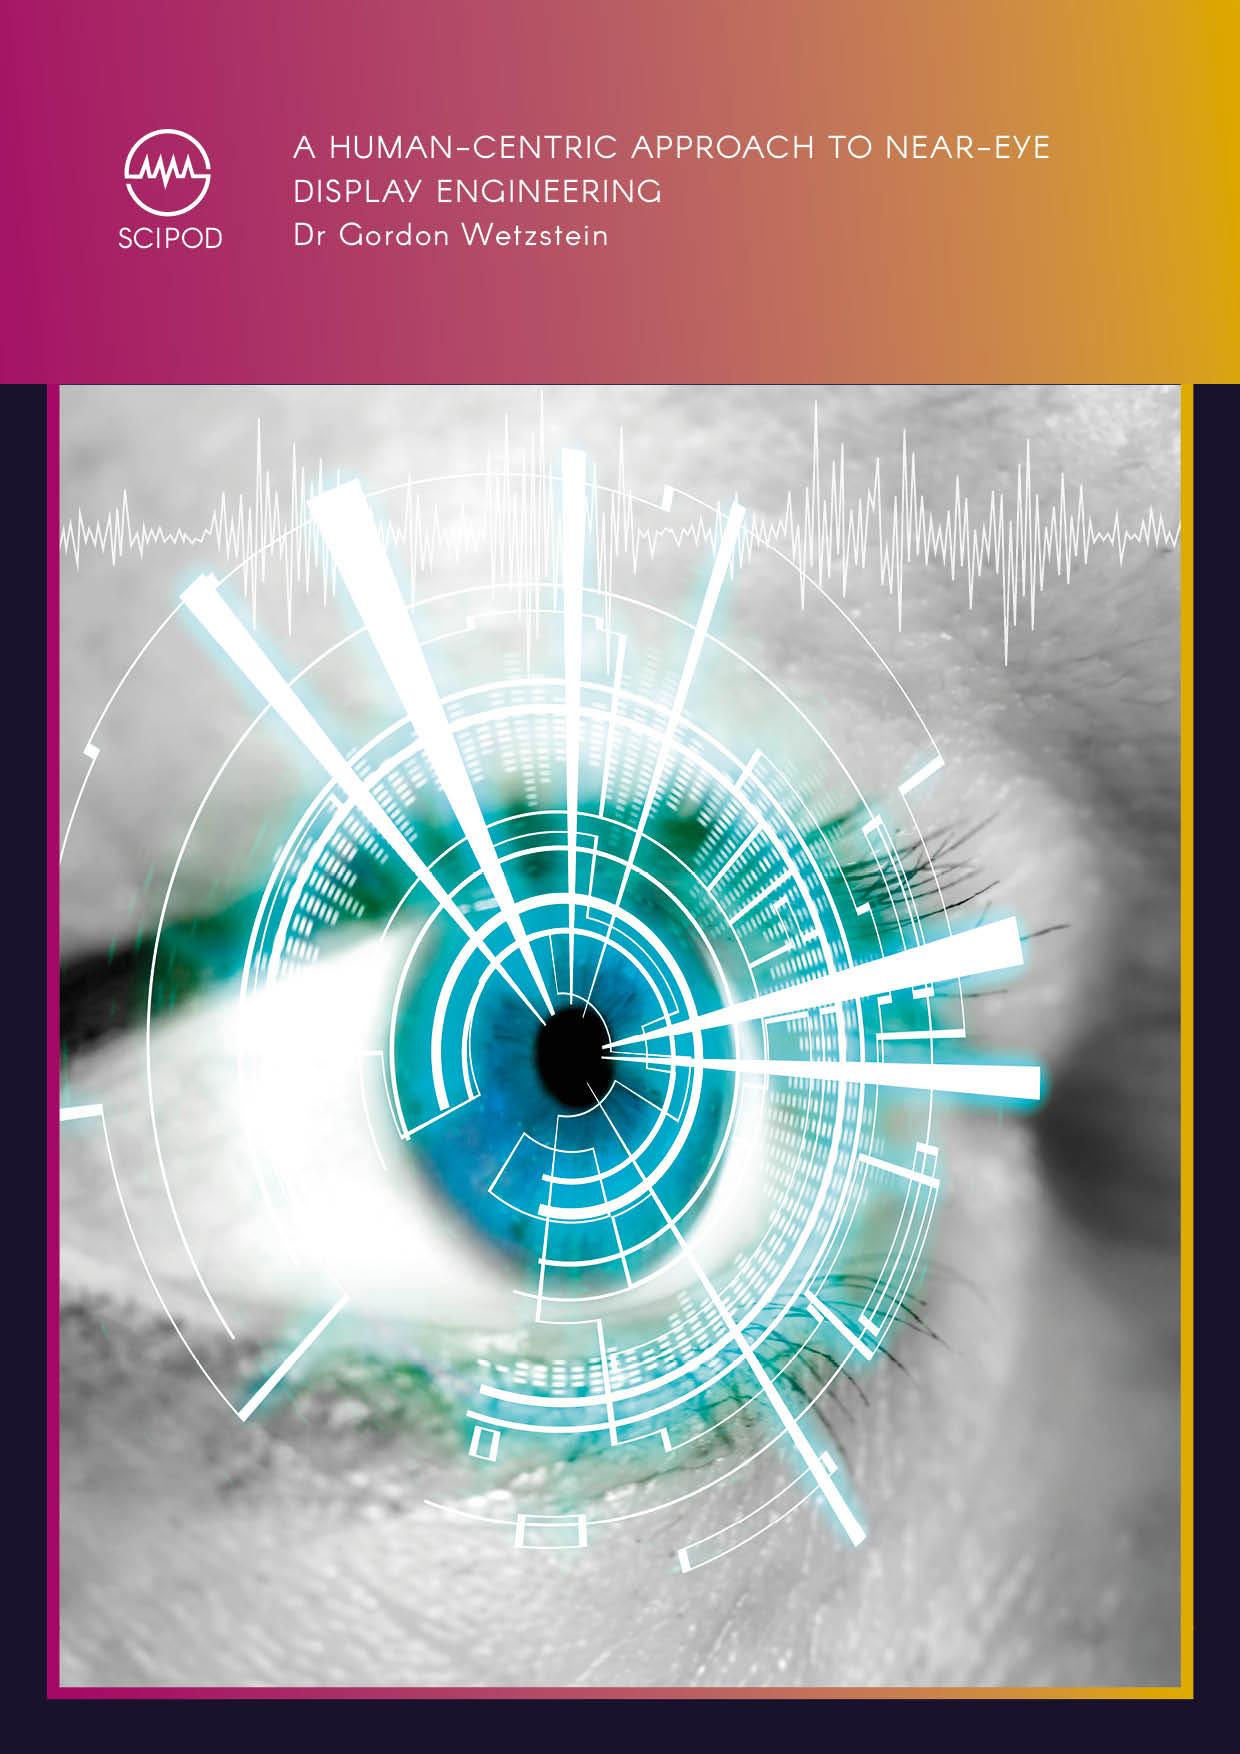 A Human-centric Approach to Near-eye Display Engineering – Dr Gordon Wetzstein, Stanford University